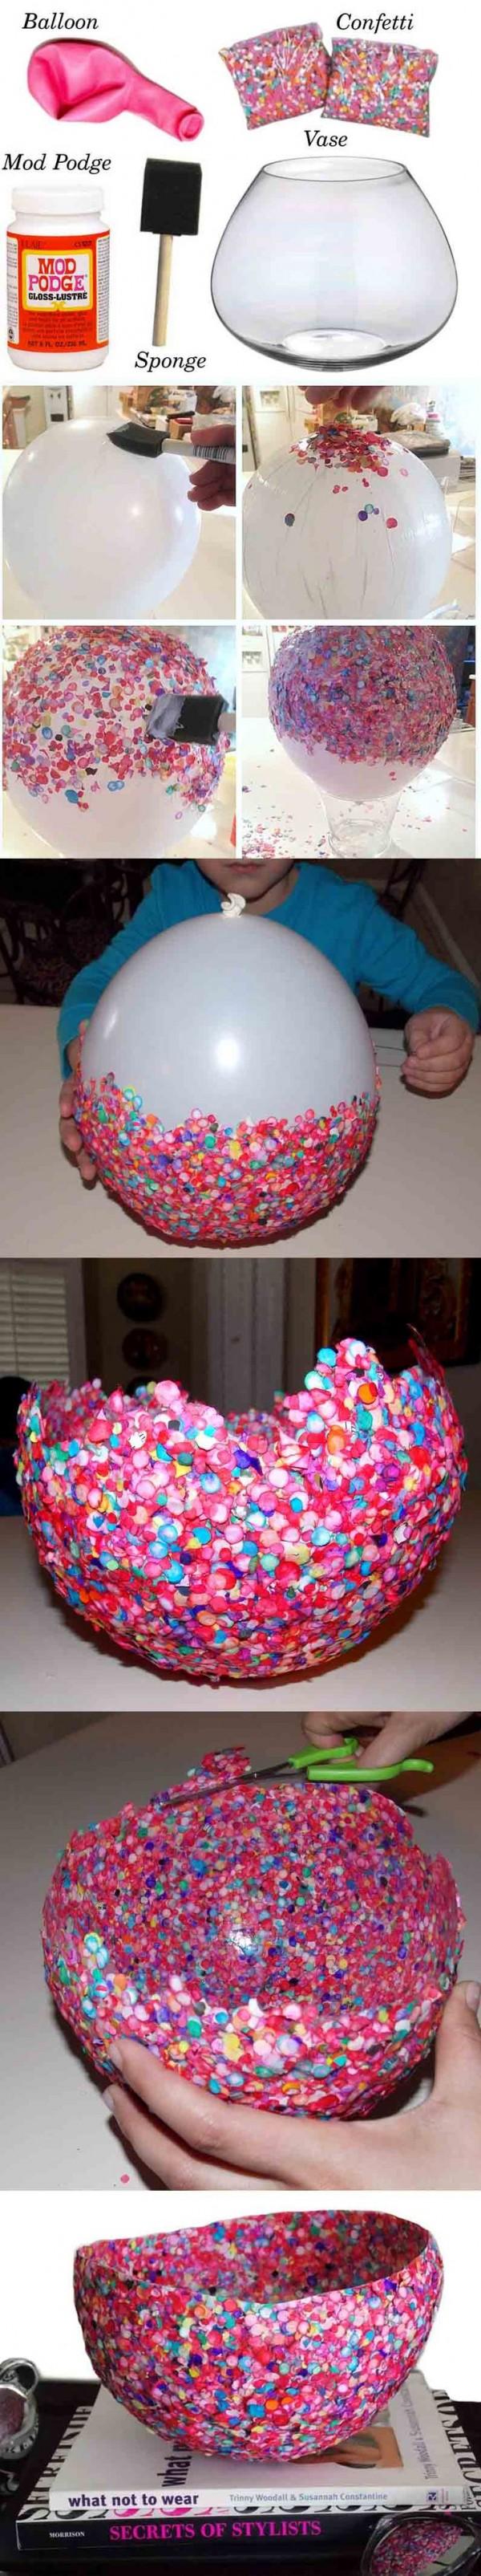 bowl confeti